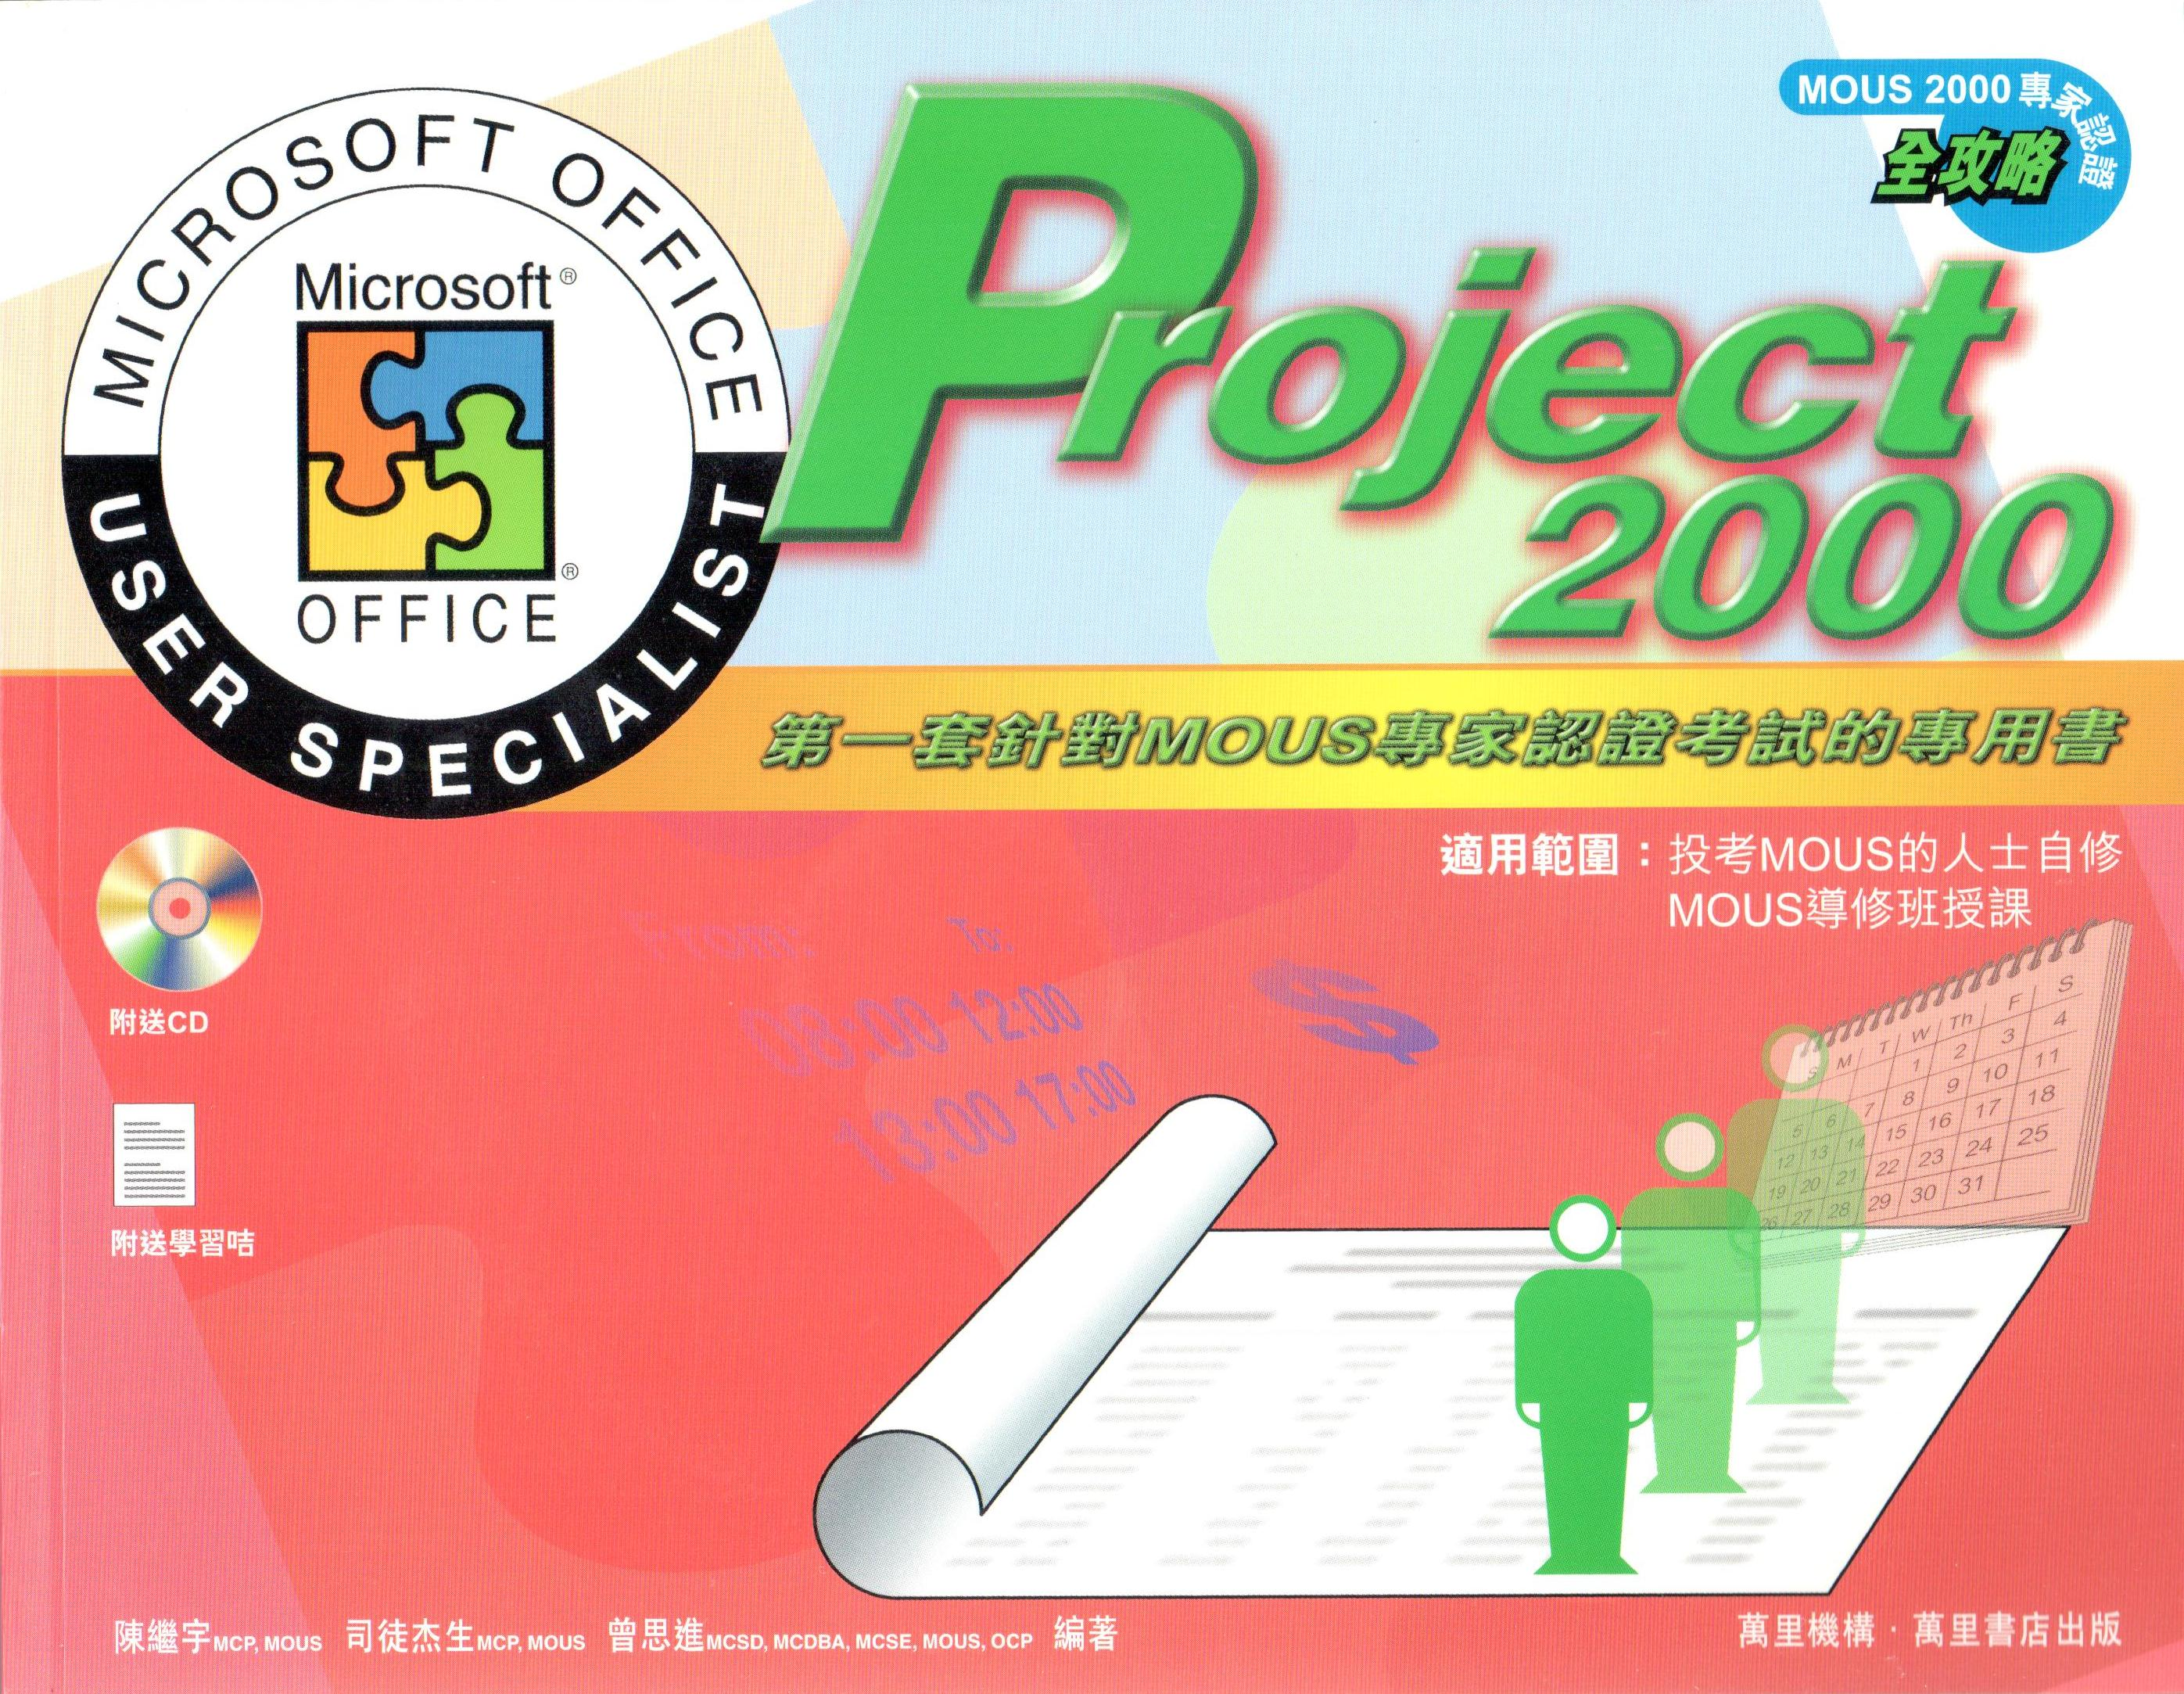 Project 2000 微軟辦公室專家認證全攻略